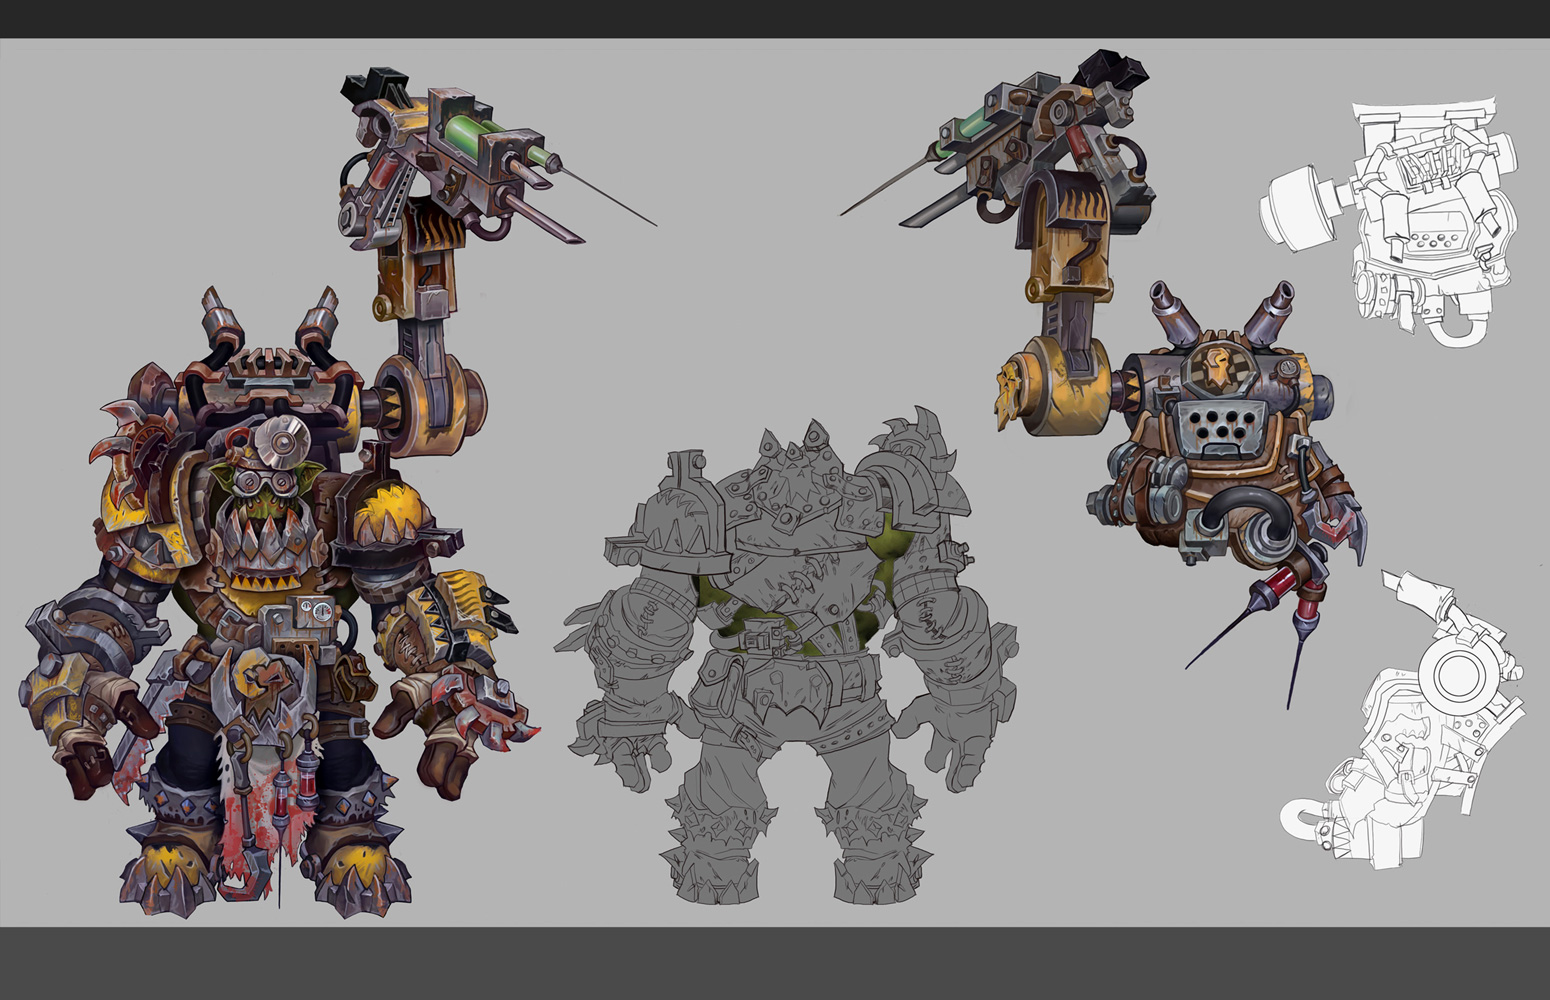 [E3] Eternal Crusade, un MMO Warhammer 40K - Page 3 15